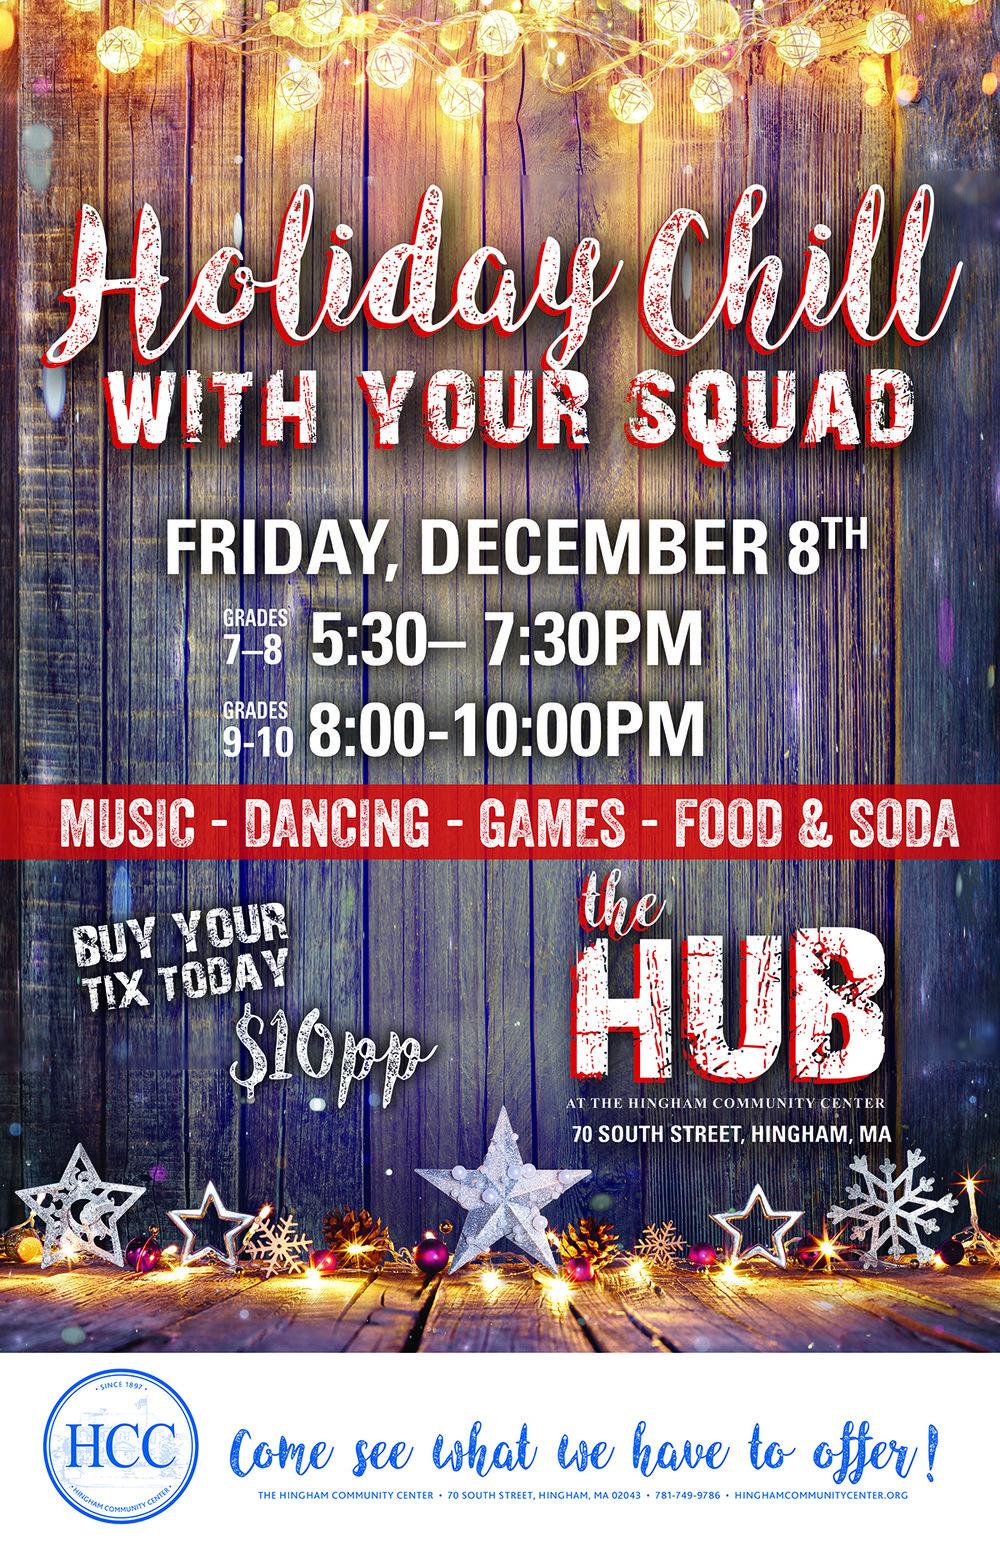 HCC_The Hub Dec 8th Event Poster_11x17_dbd_upload.jpg